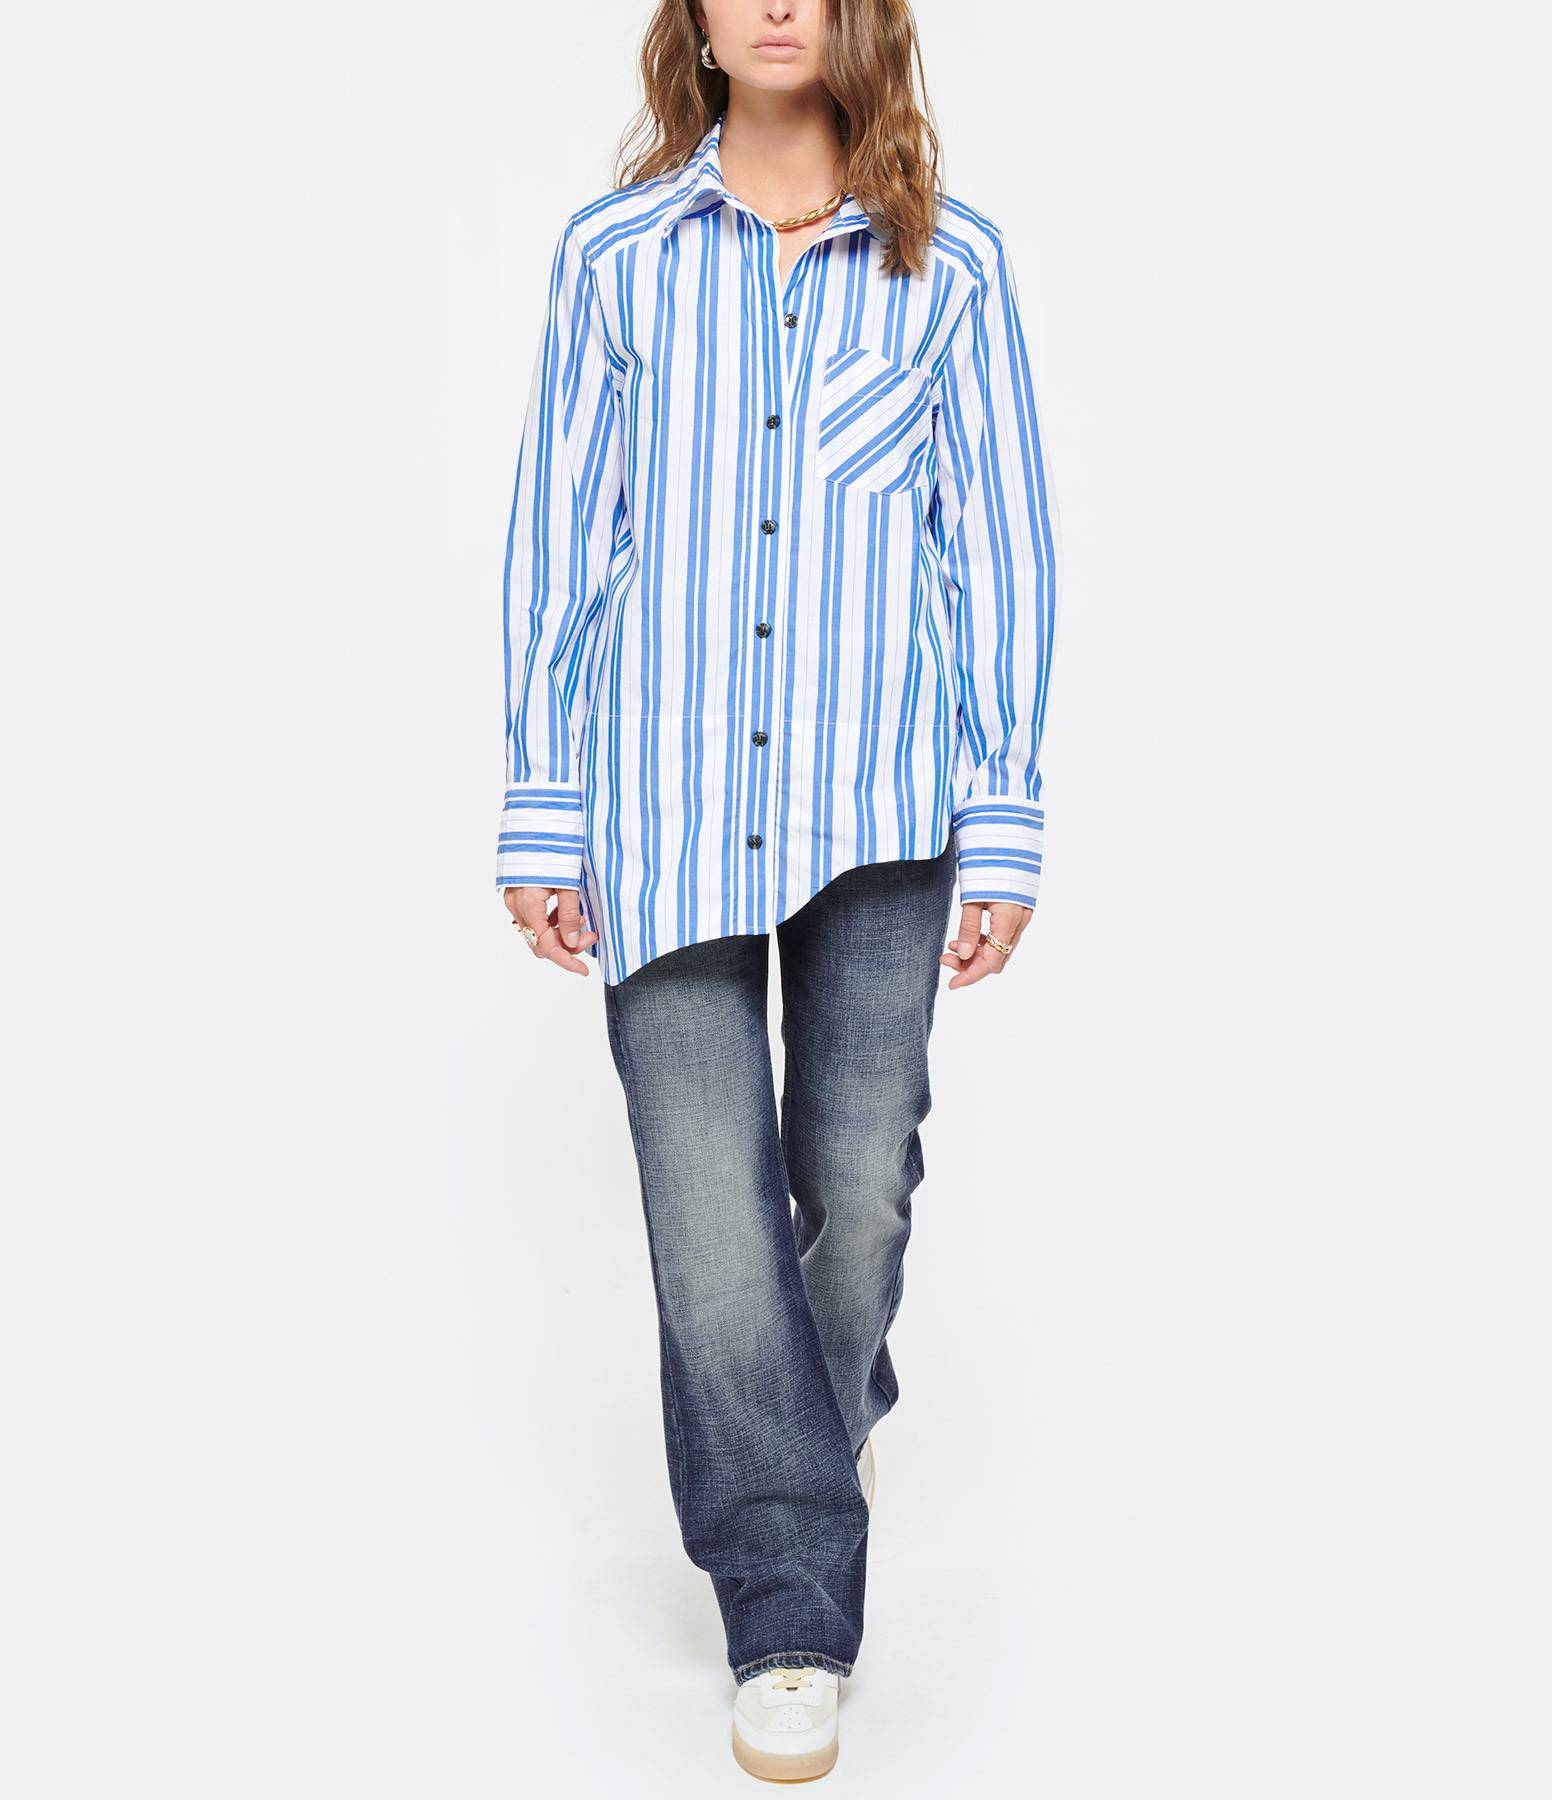 GANNI - Chemise Coton Rayures Blanc Bleu